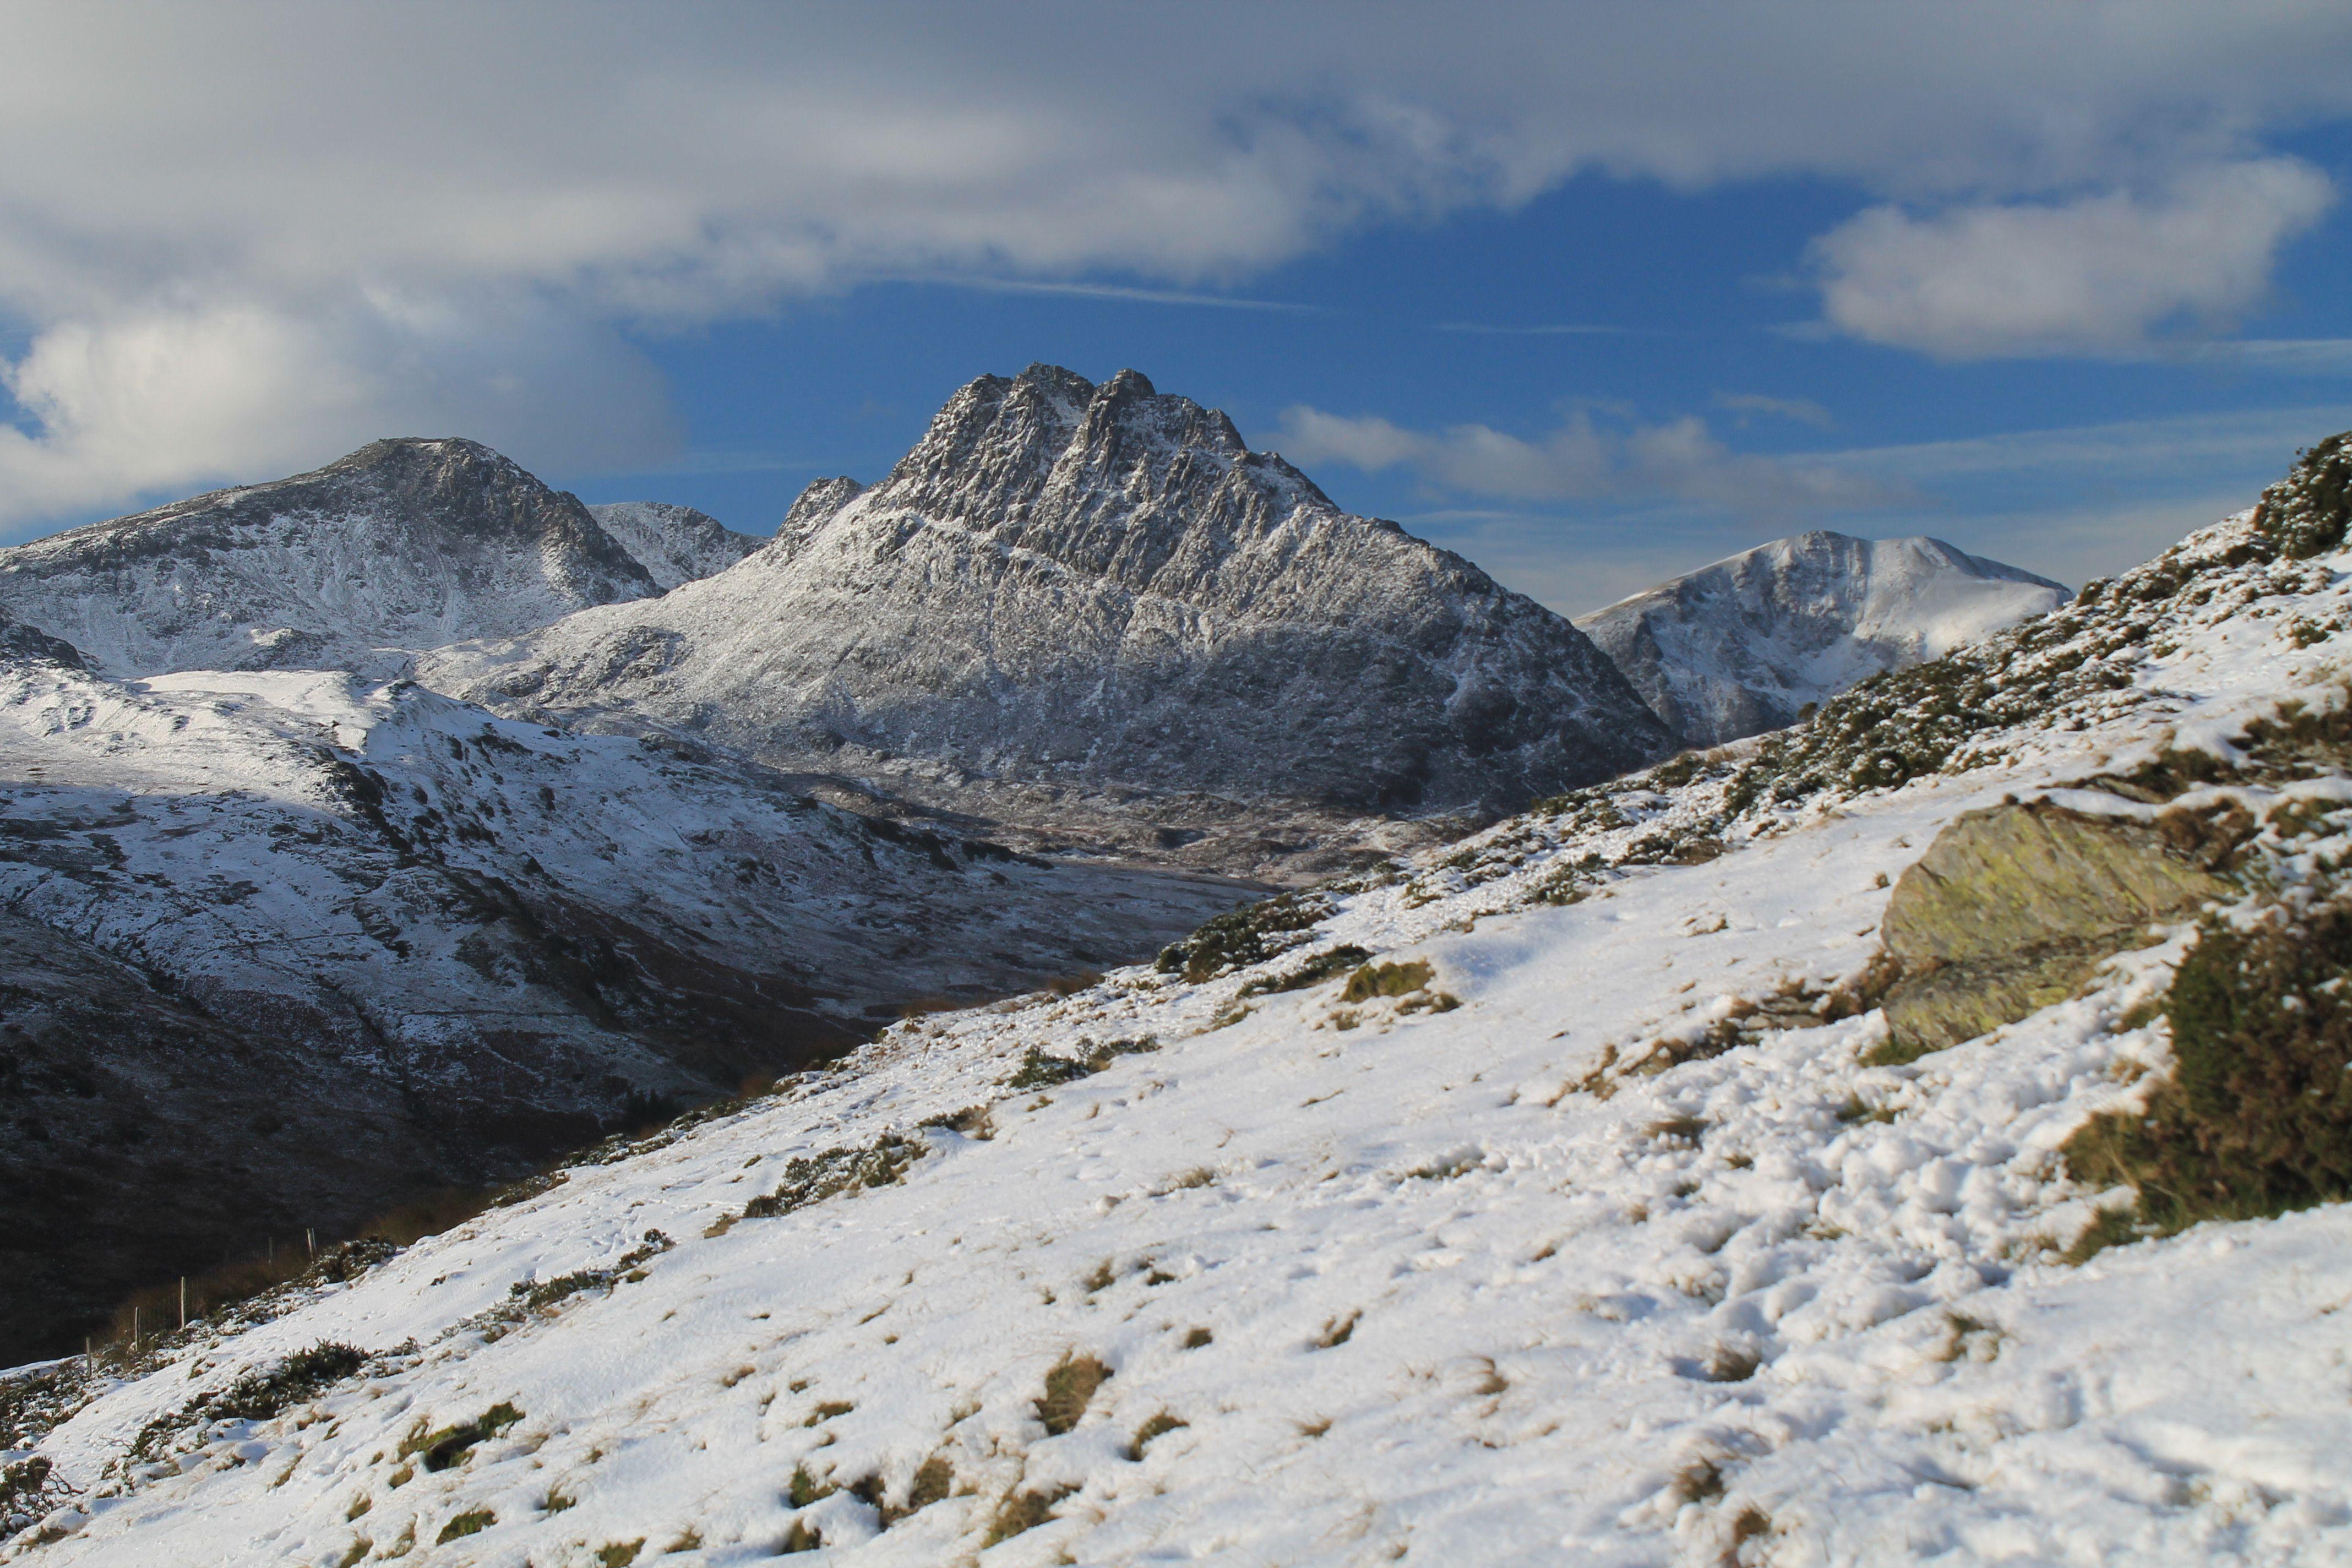 Tryfan from the lower slopes of Pen yr Helgi Du